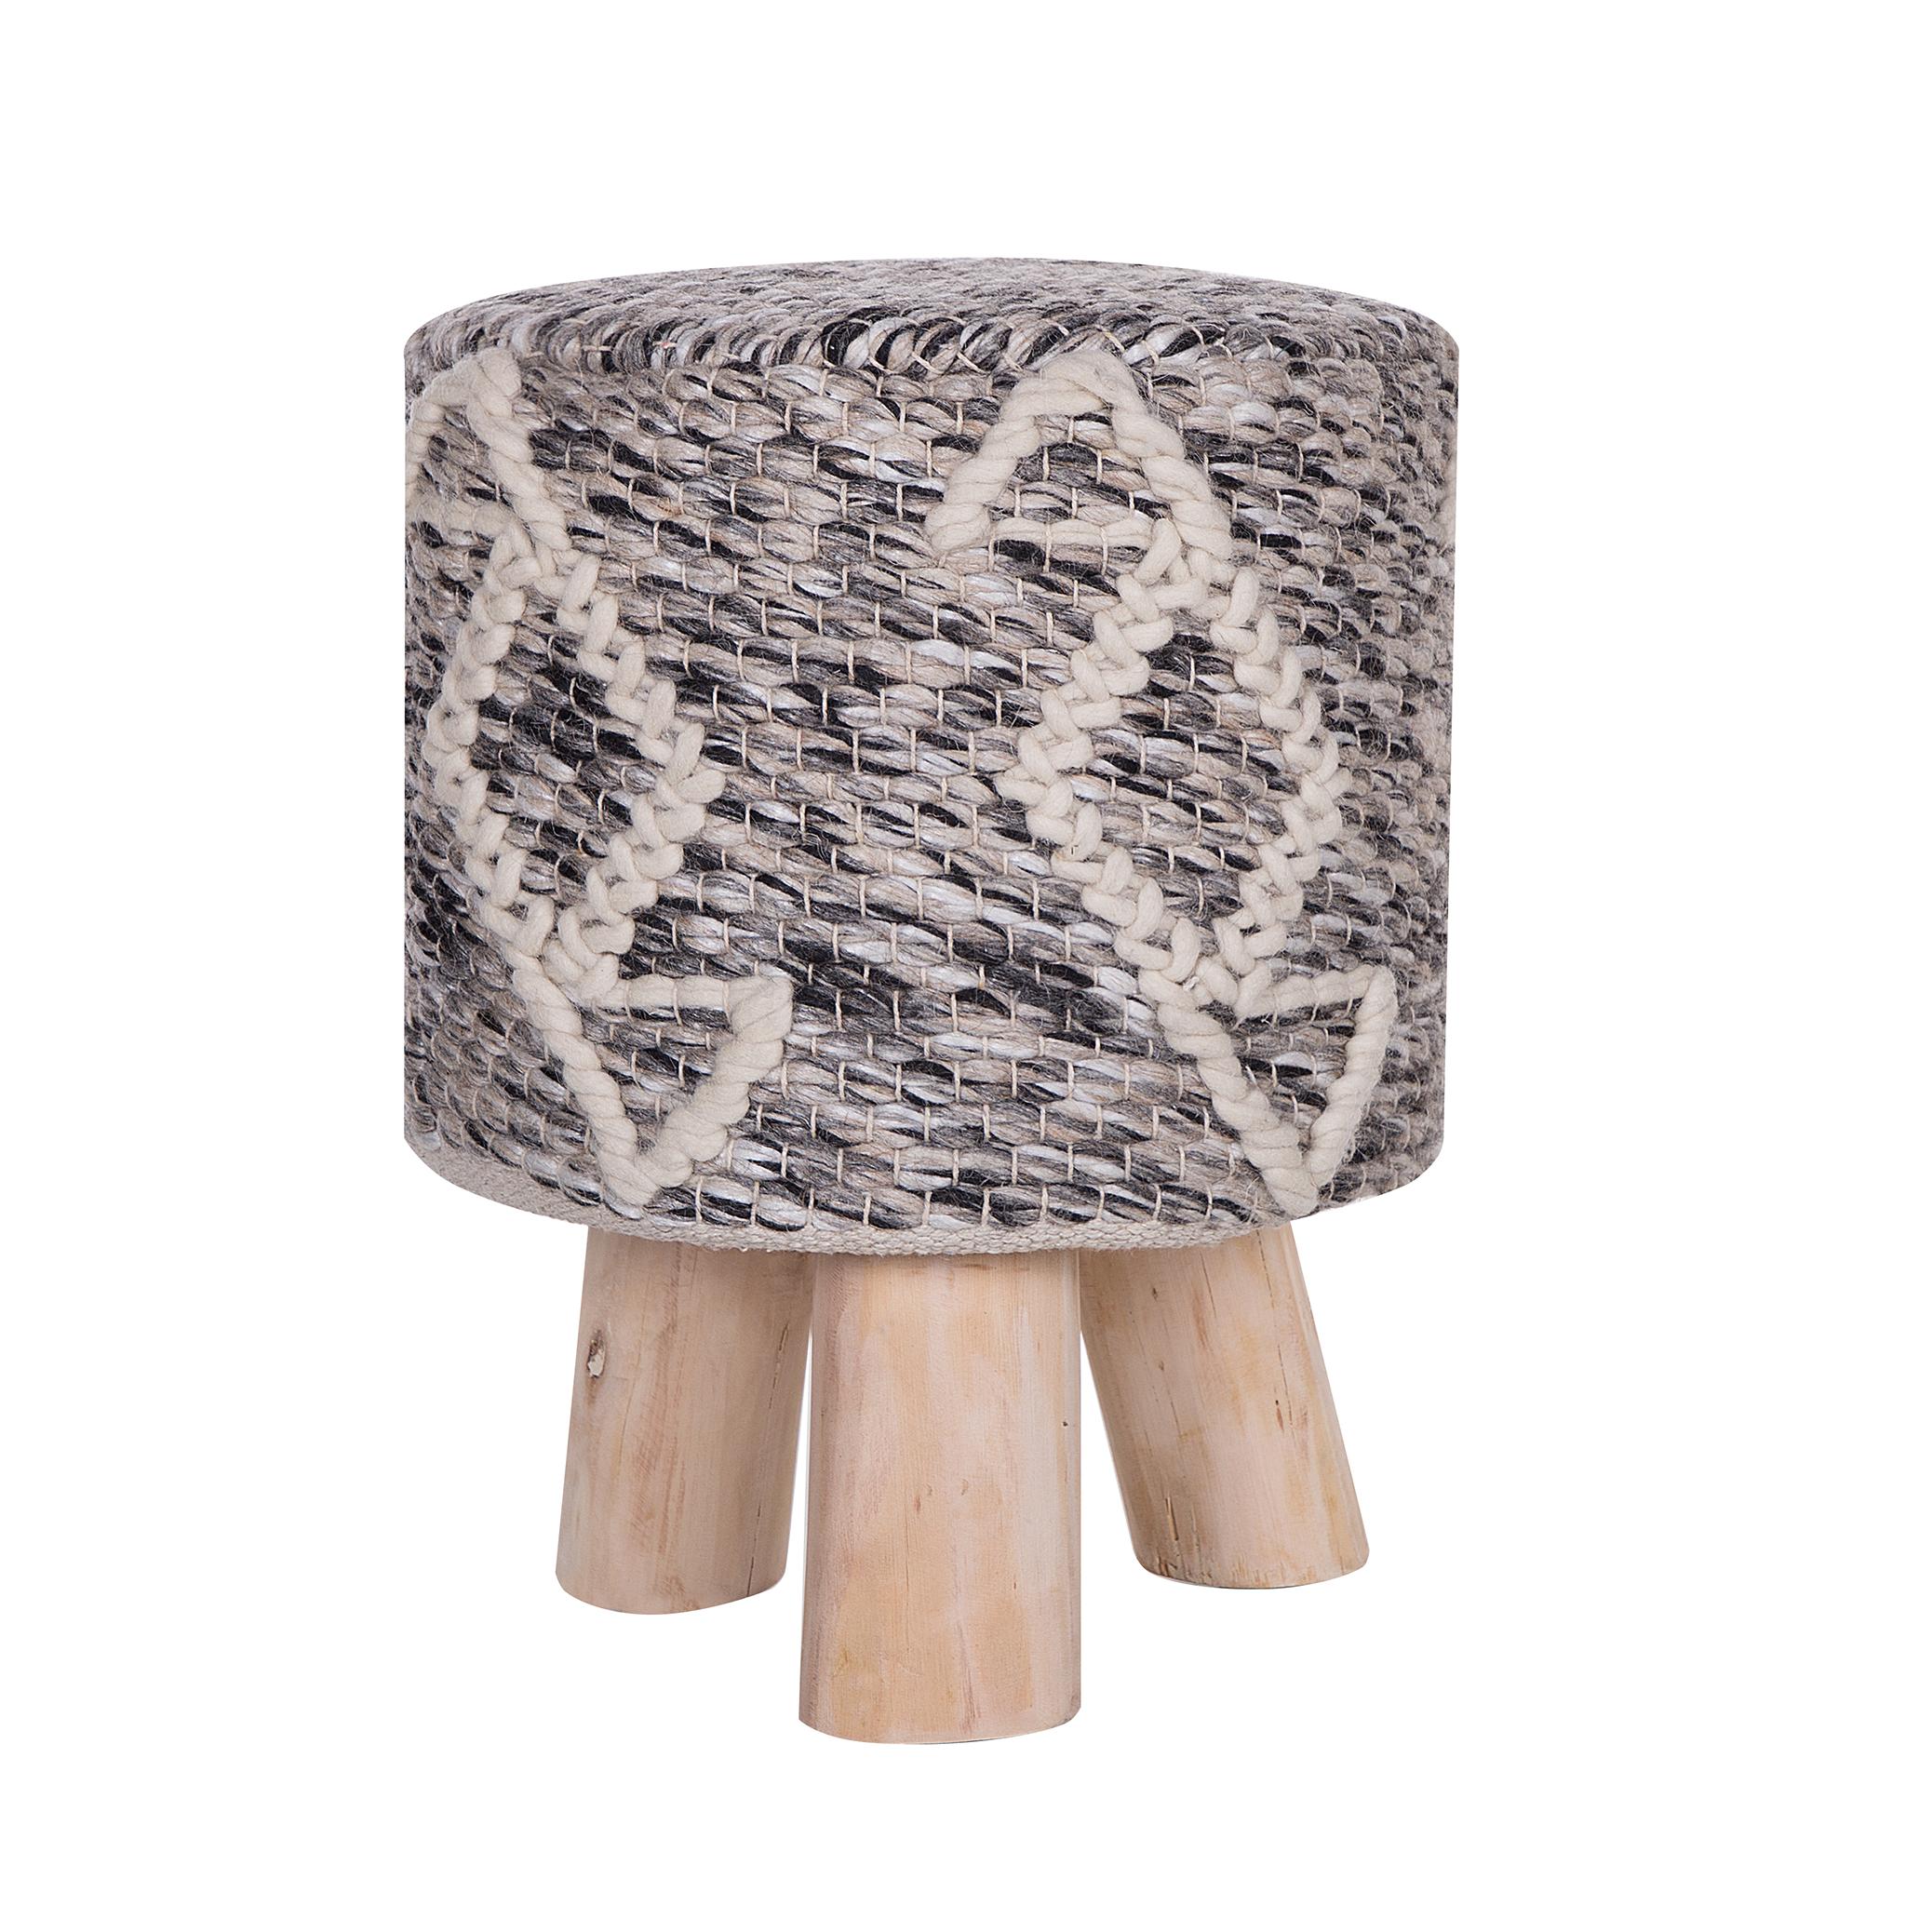 Beliani Footstool Taupe Wool Wooden Legs Oriental Pattern Rustic